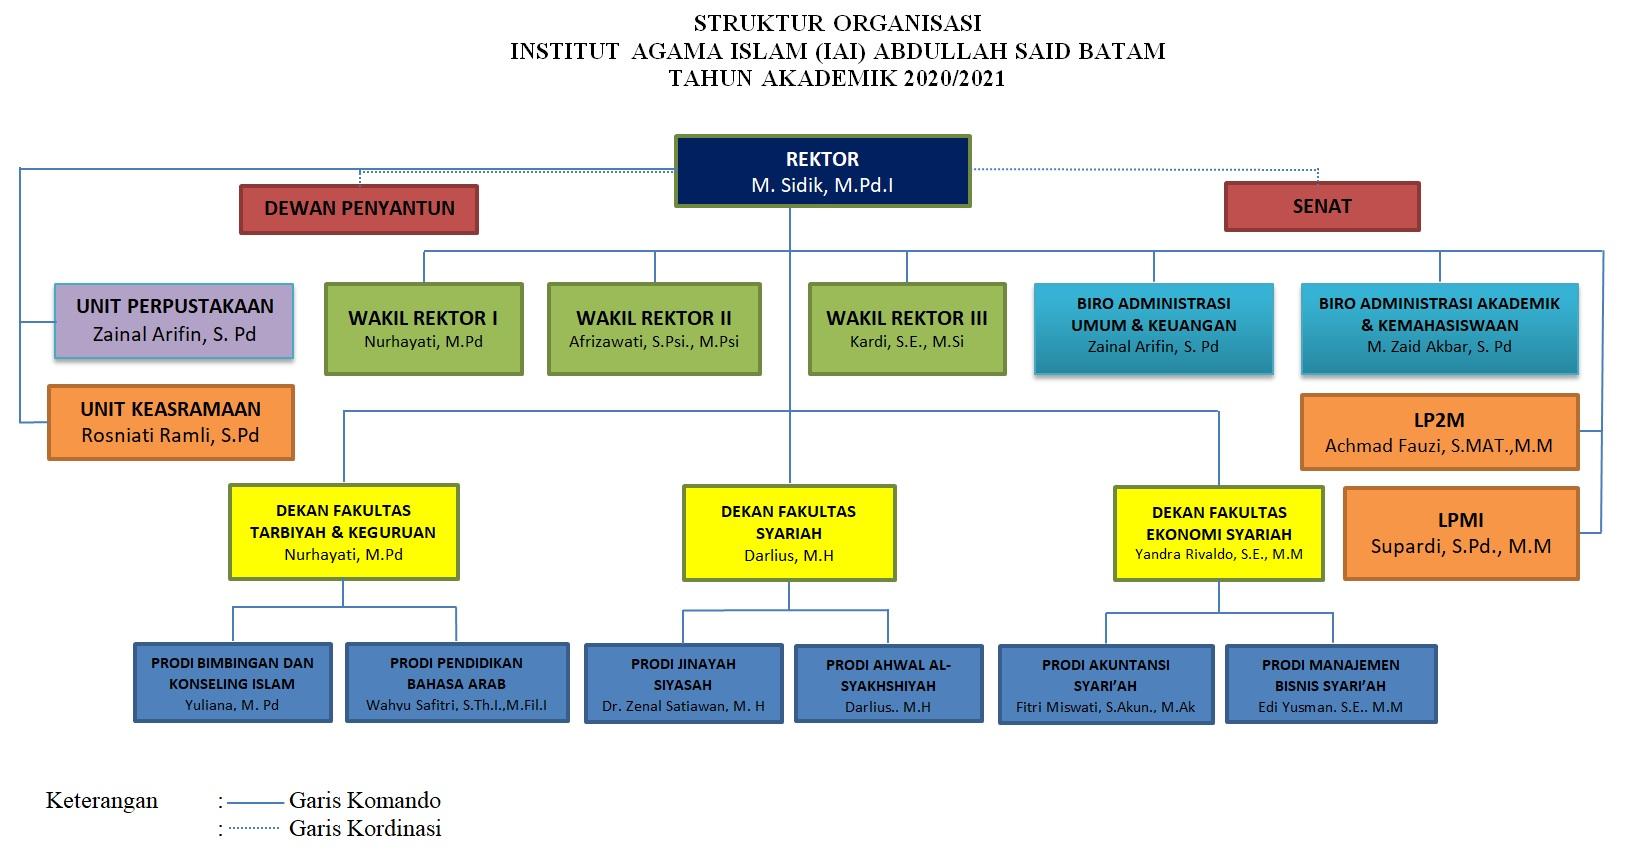 Struktur Organisasi IAI Abdullah Said Batam Tahun Akademik 2020/2021